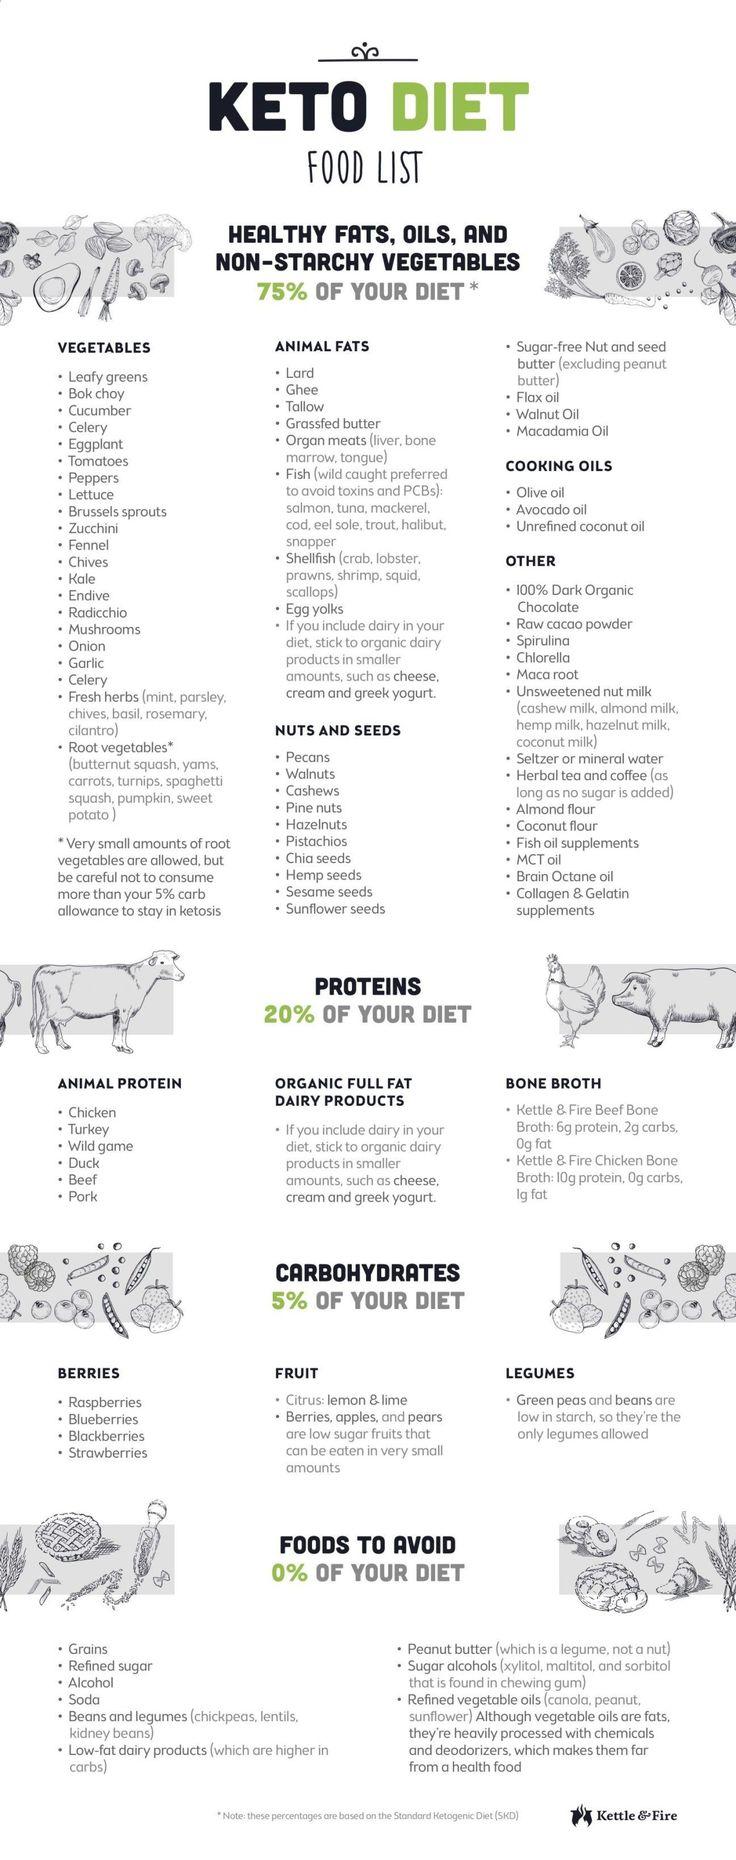 Control Diabetes in Only 2 Weeks The Ultimate Keto Diet